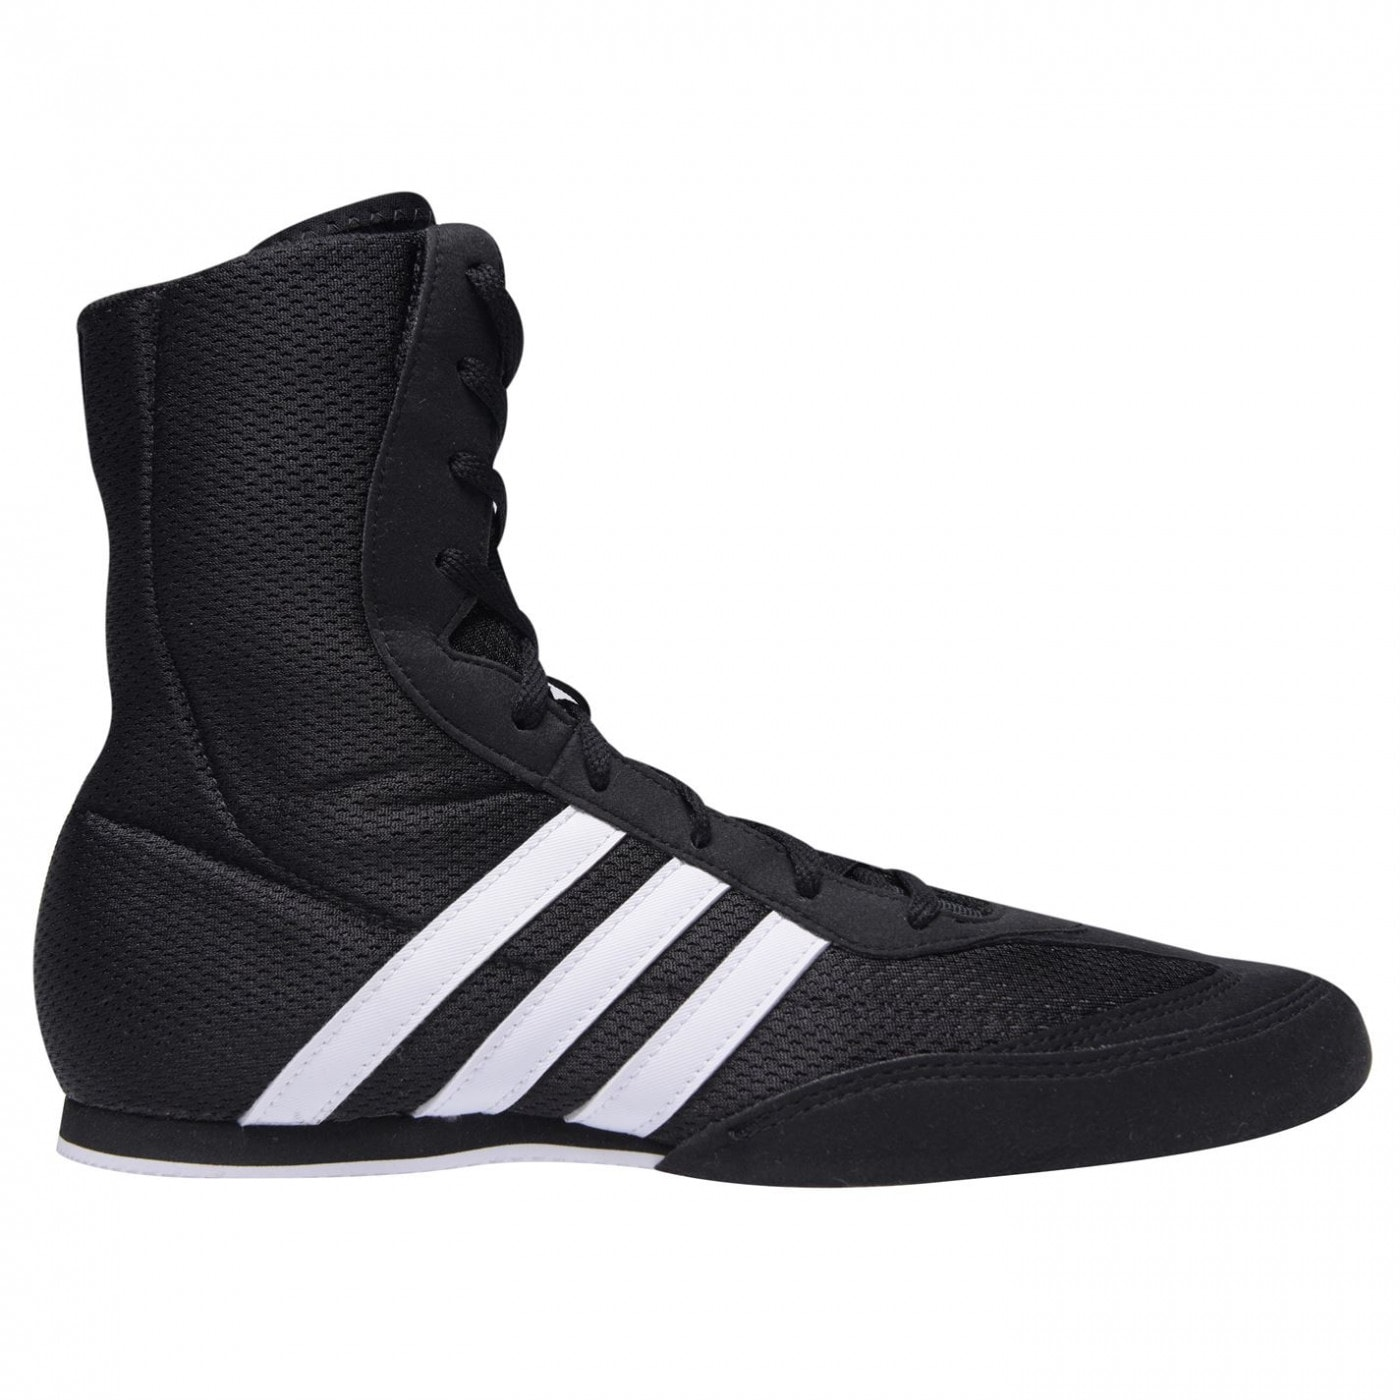 Adidas Box Hog2 BootSn00